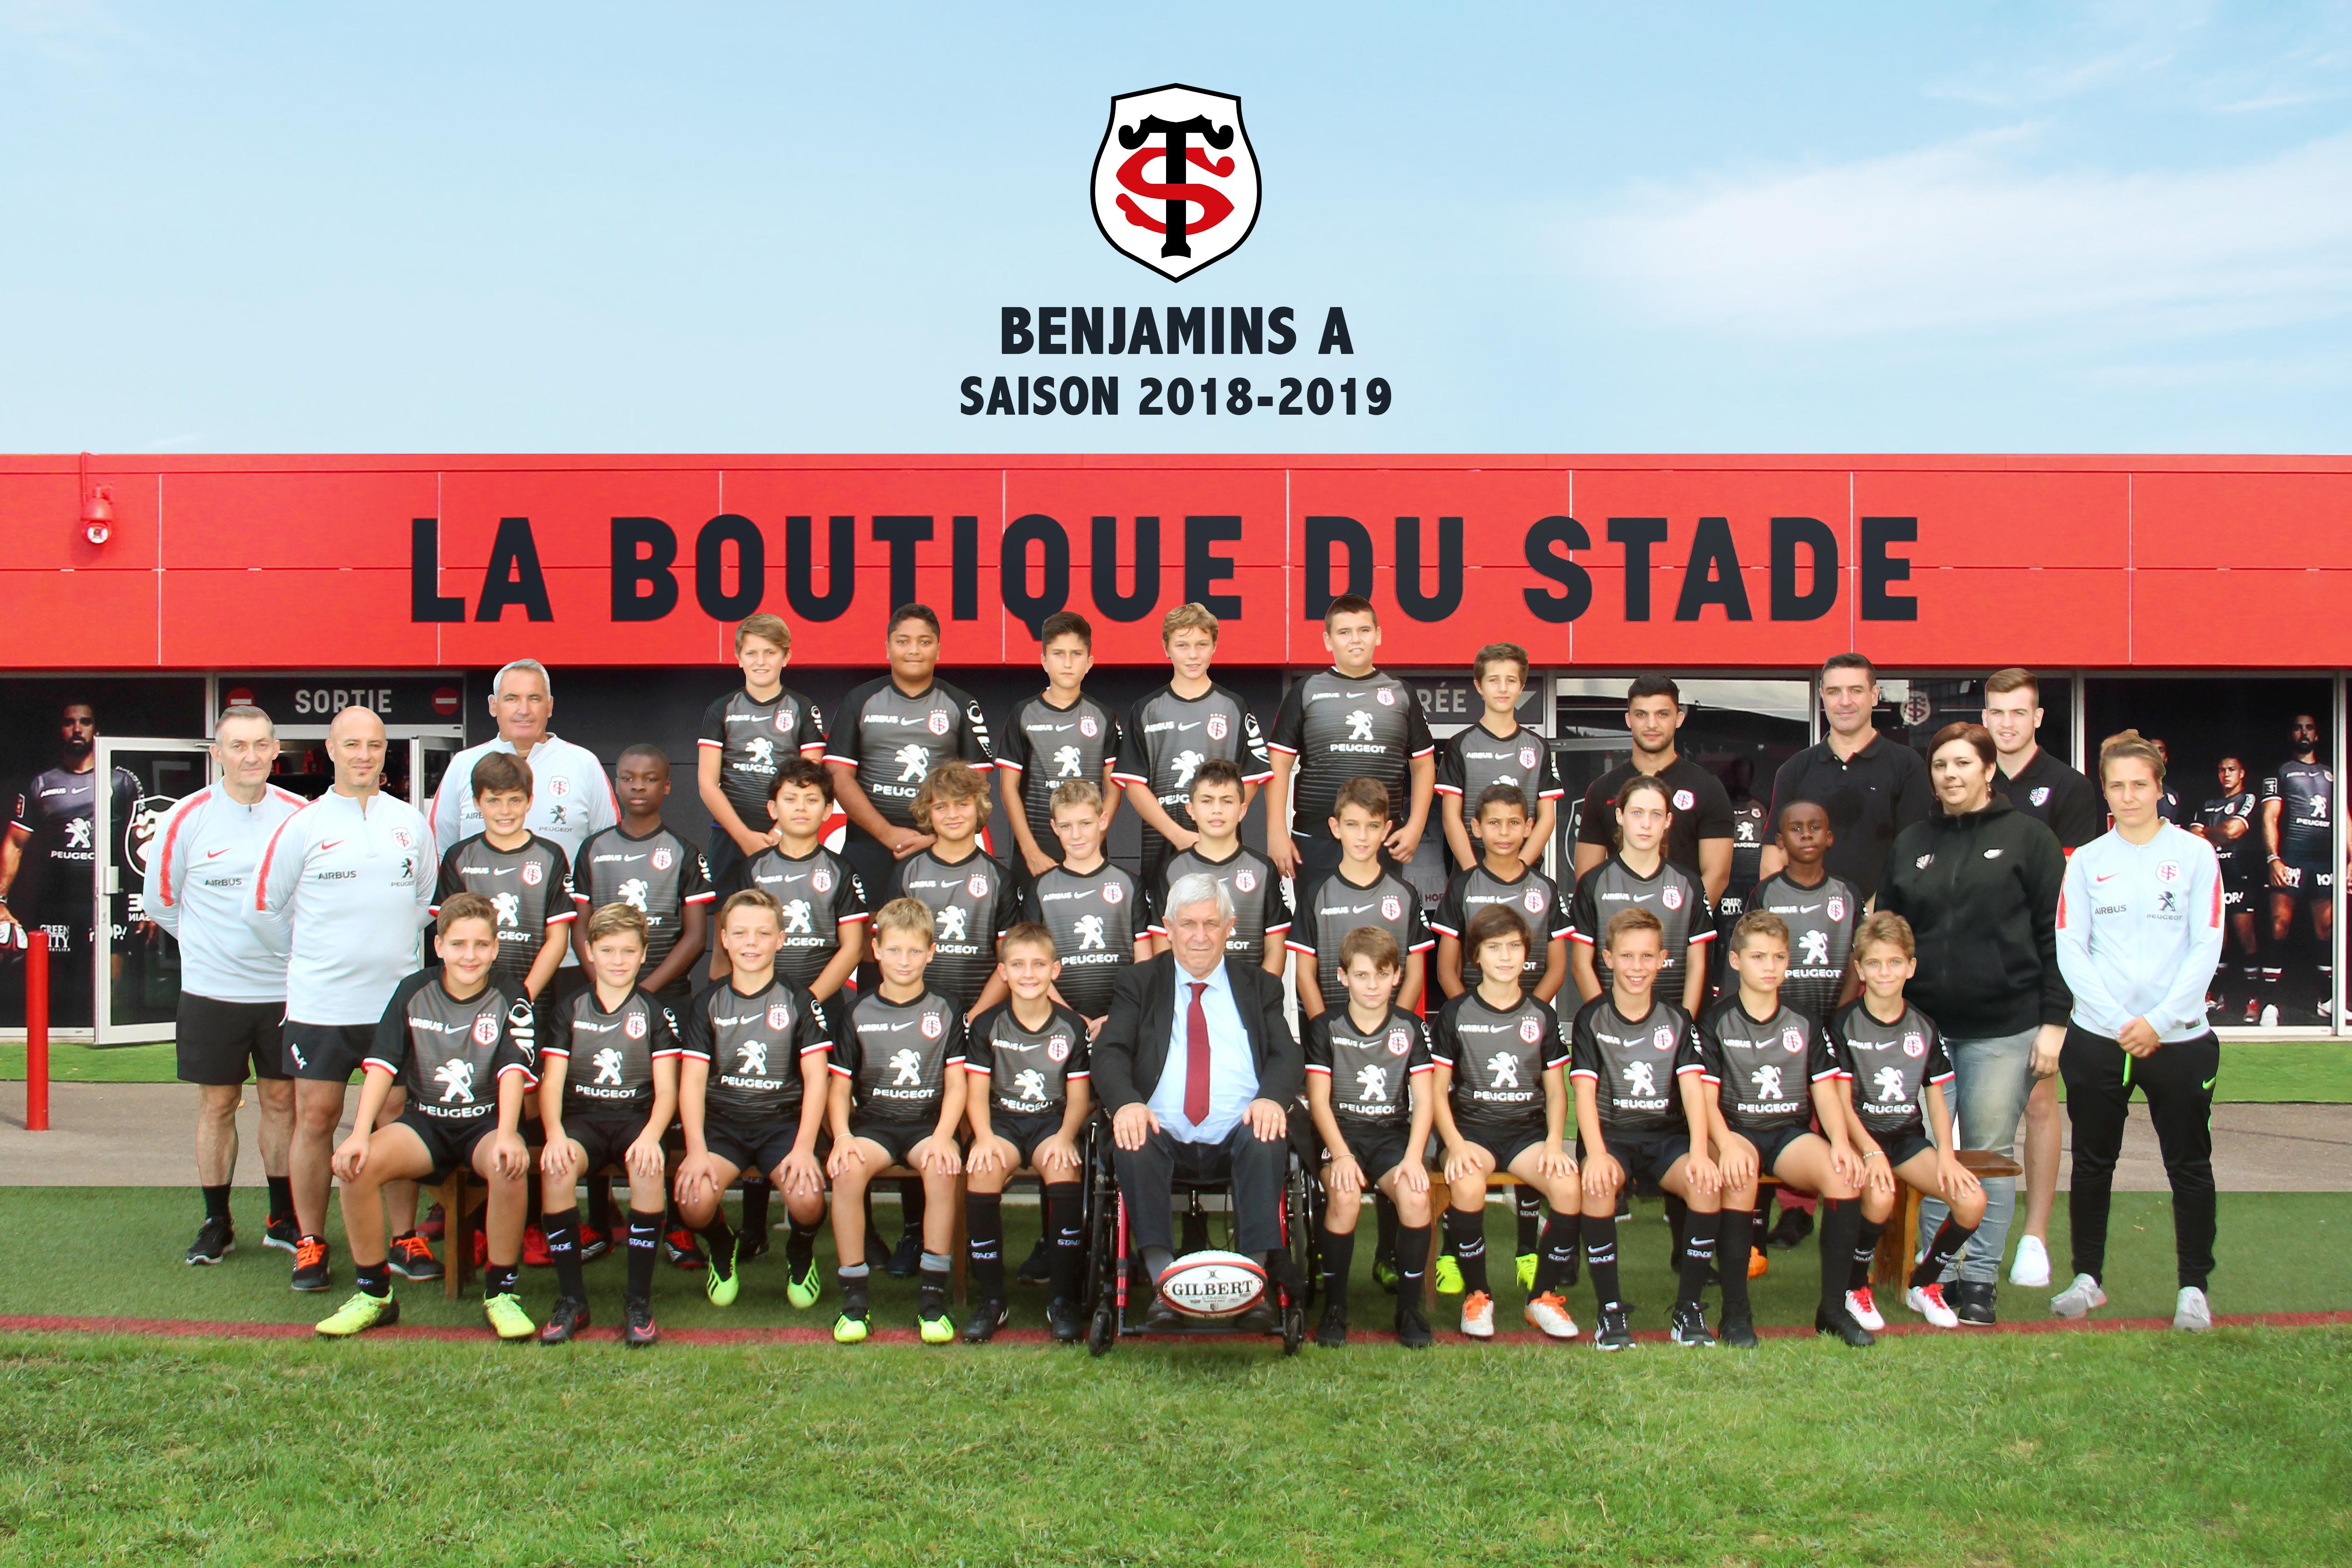 Calendrier Stade Toulousain 2019.St Benjamins A Association Du Stade Toulousain